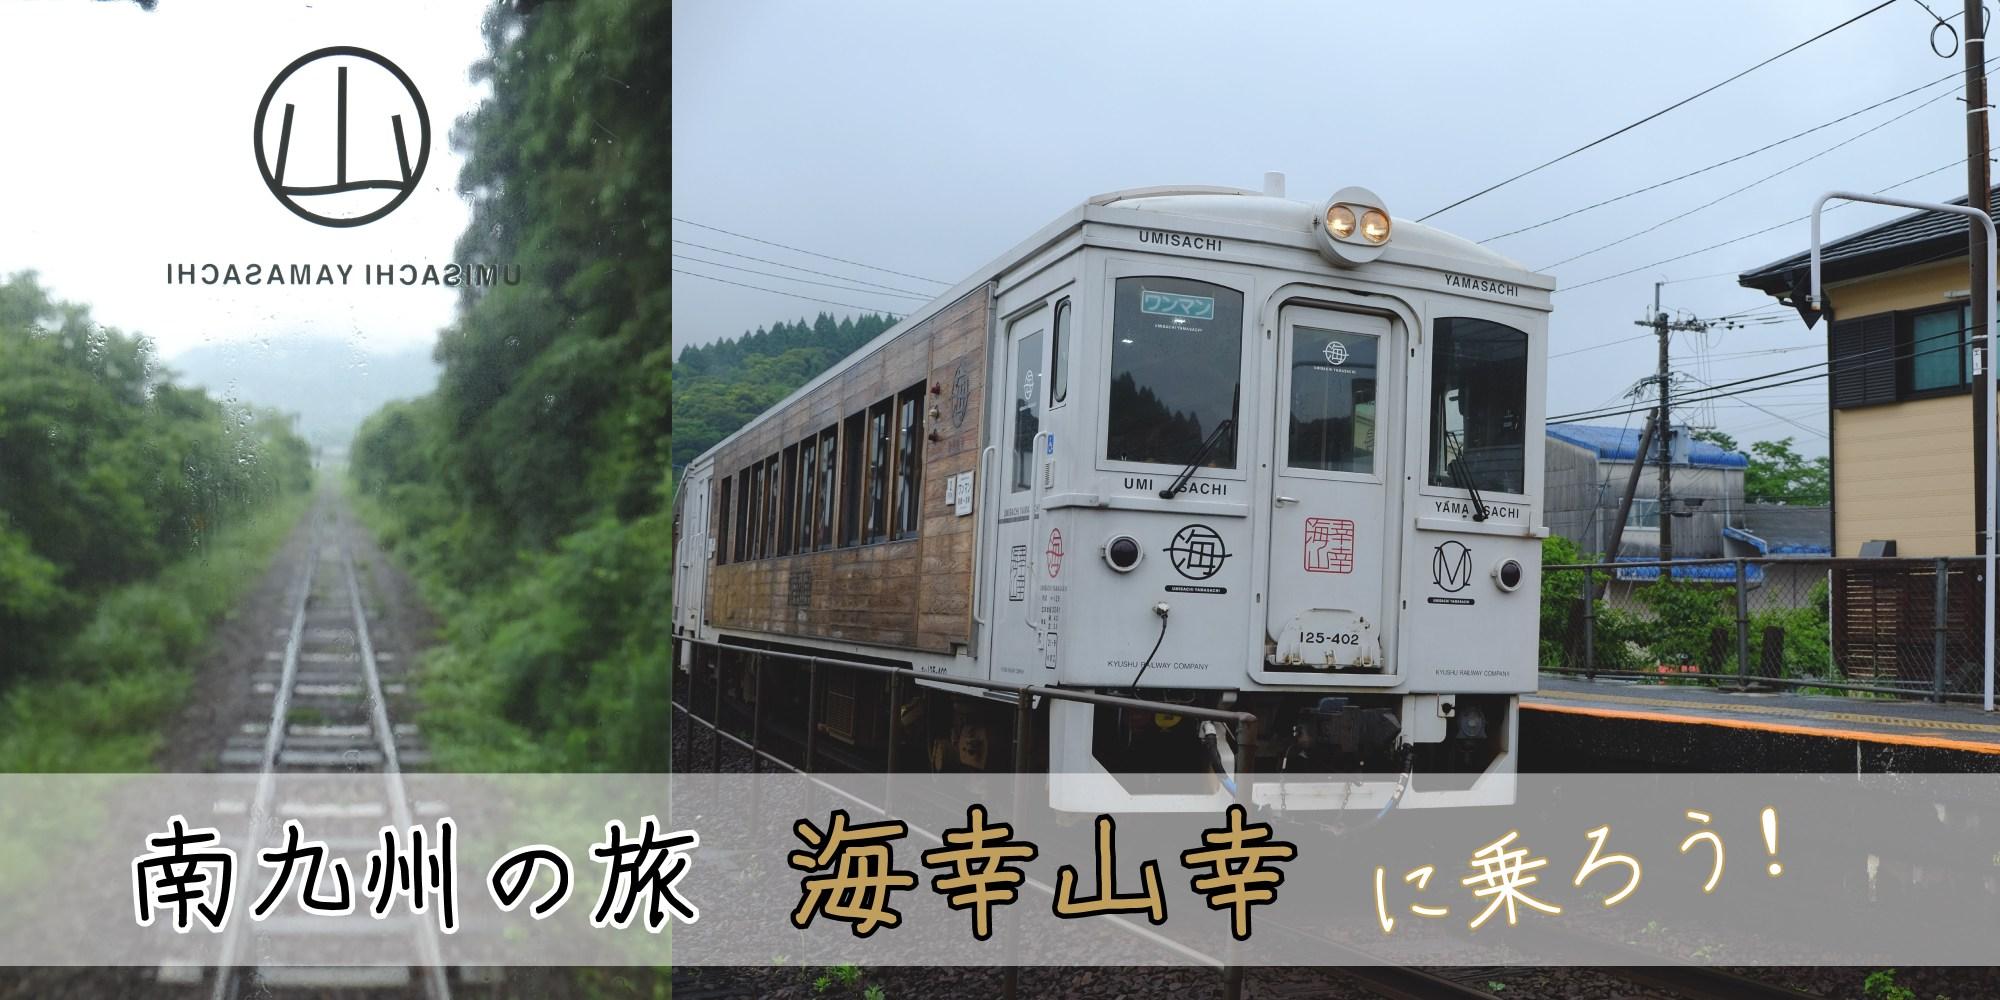 【JR九州電車】乘海幸山幸欣賞南宮崎 – maptabi